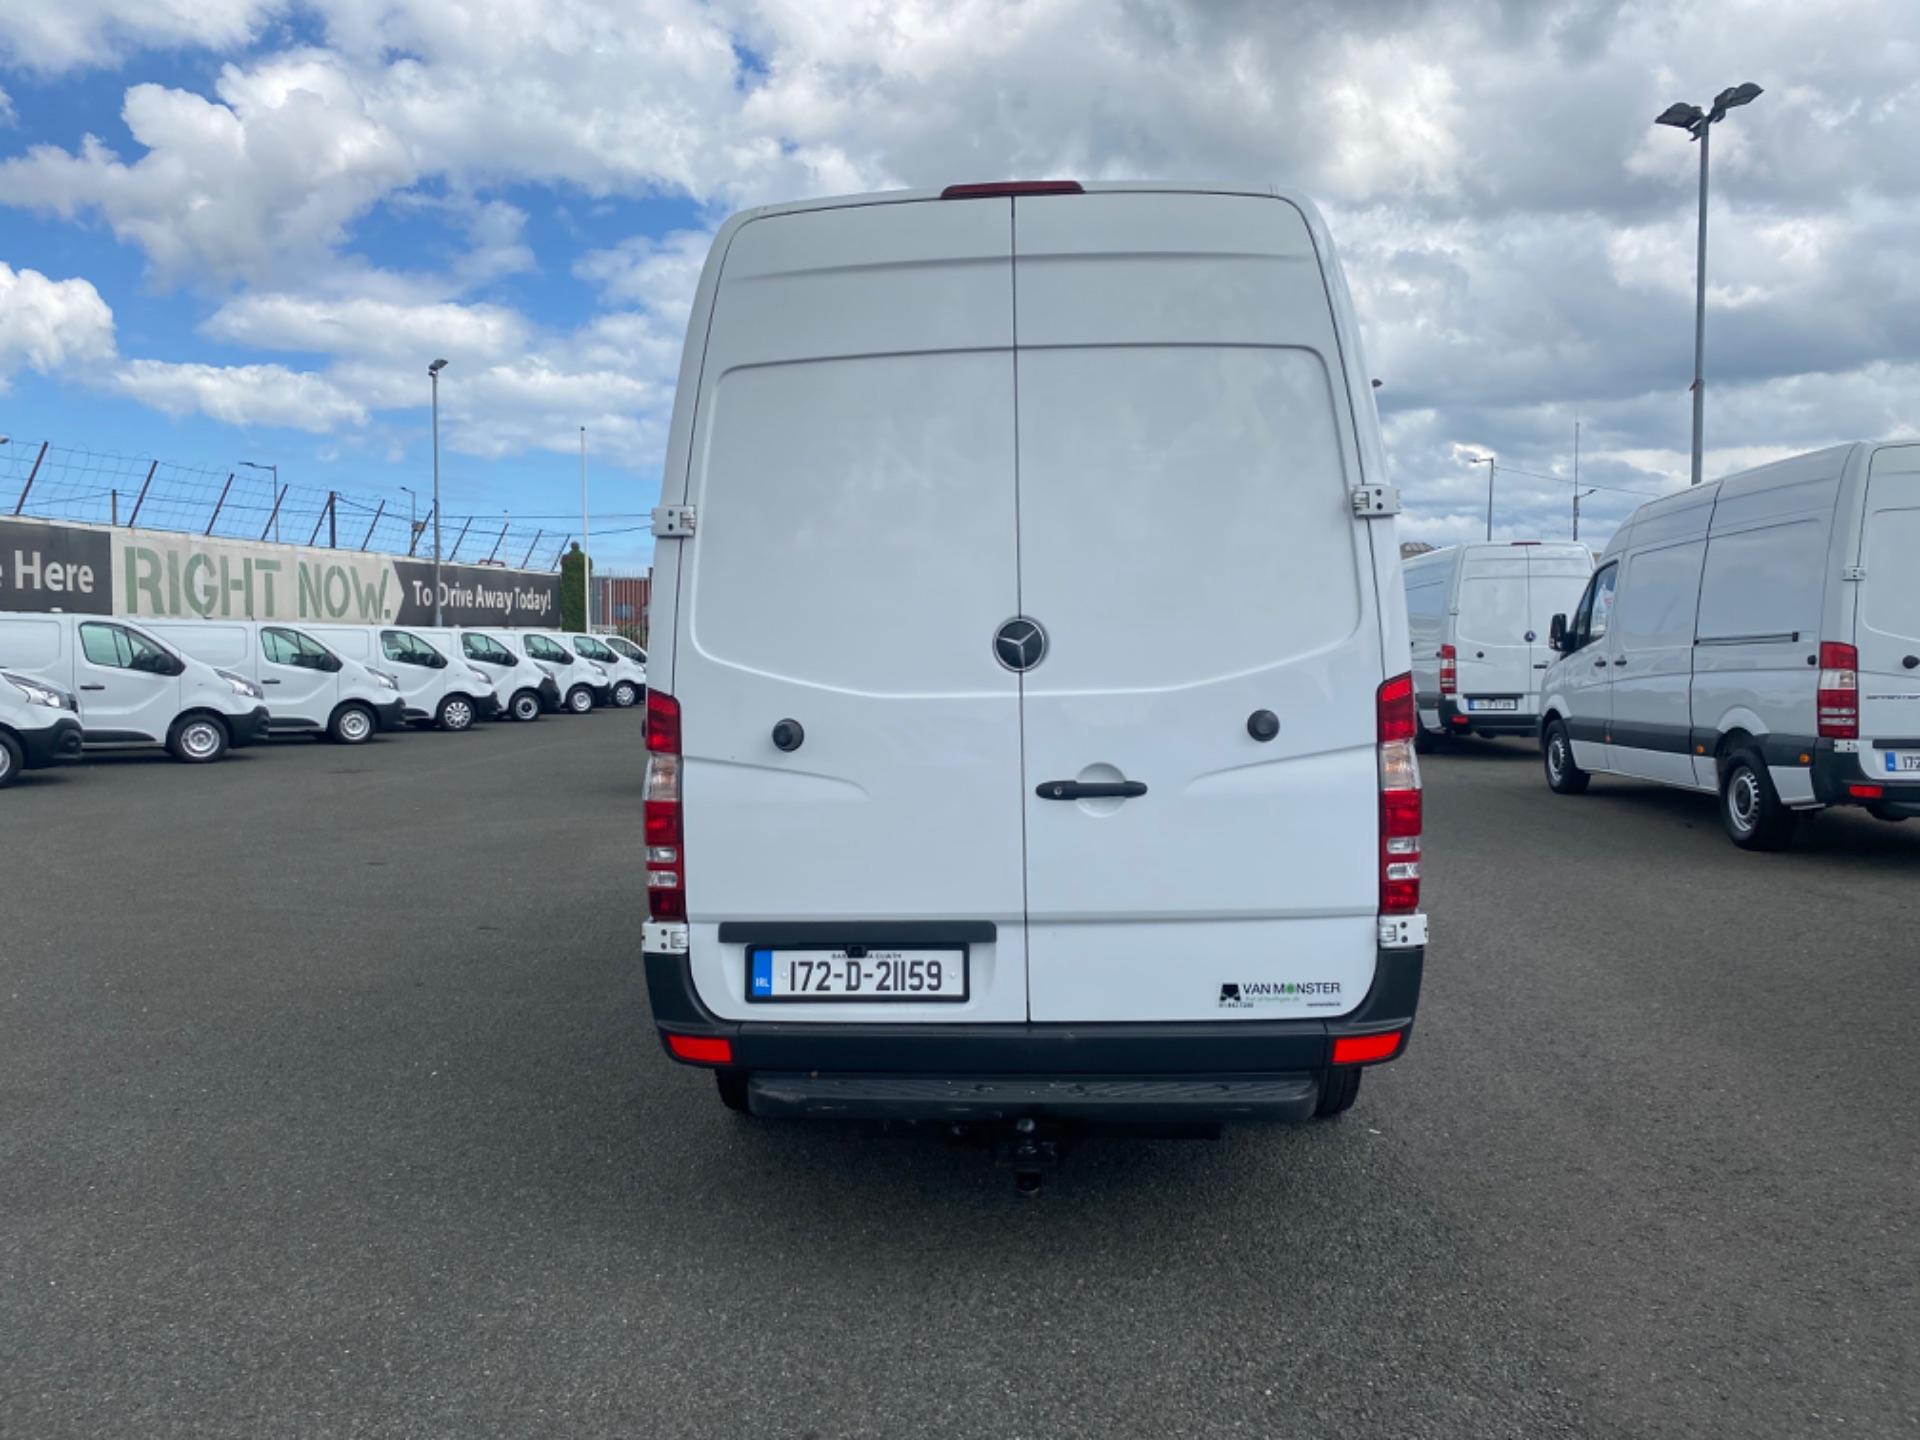 2017 Mercedes-Benz Sprinter 314/36 EU6 6DR (172D21159) Image 4